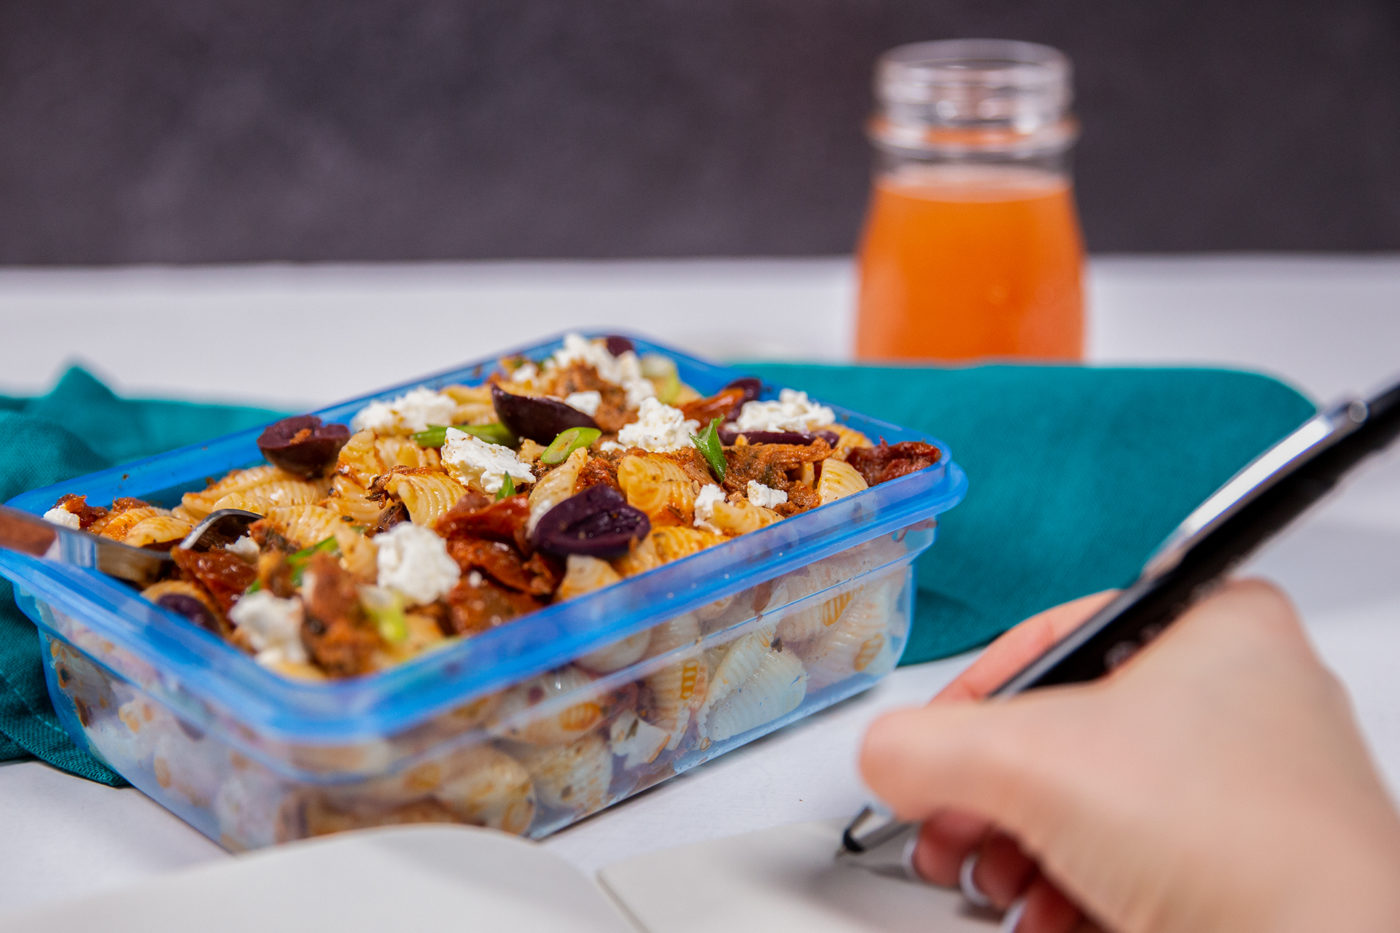 Easy Meal Prep Tuna Pasta Salad – High Protein & Kid Friendly!